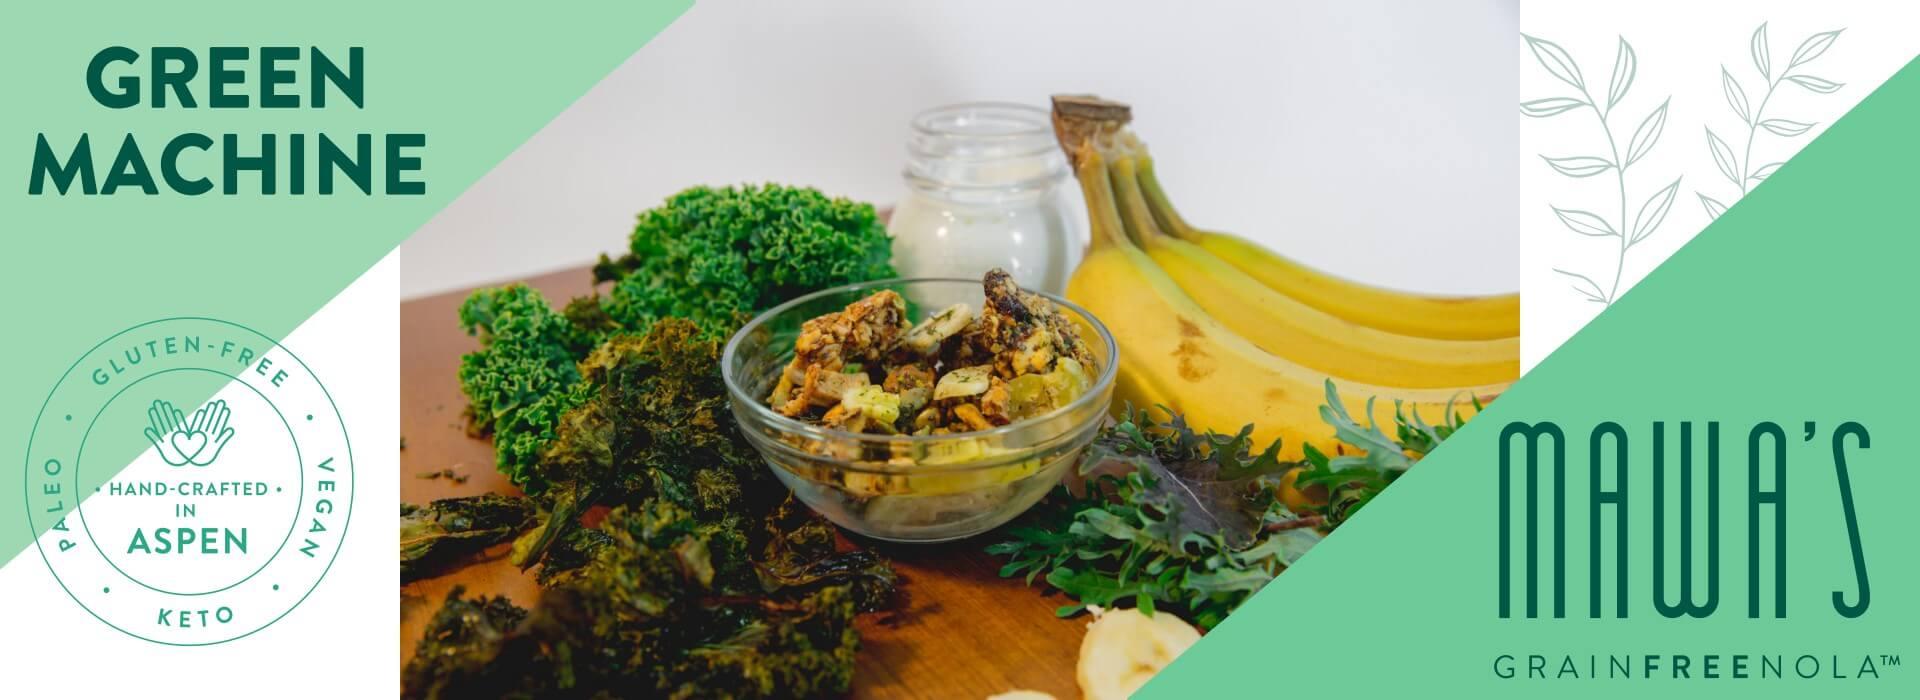 Mawa's GrainFreeNola -Green Machine Paleo, Vegan, Gluten-Free Granola